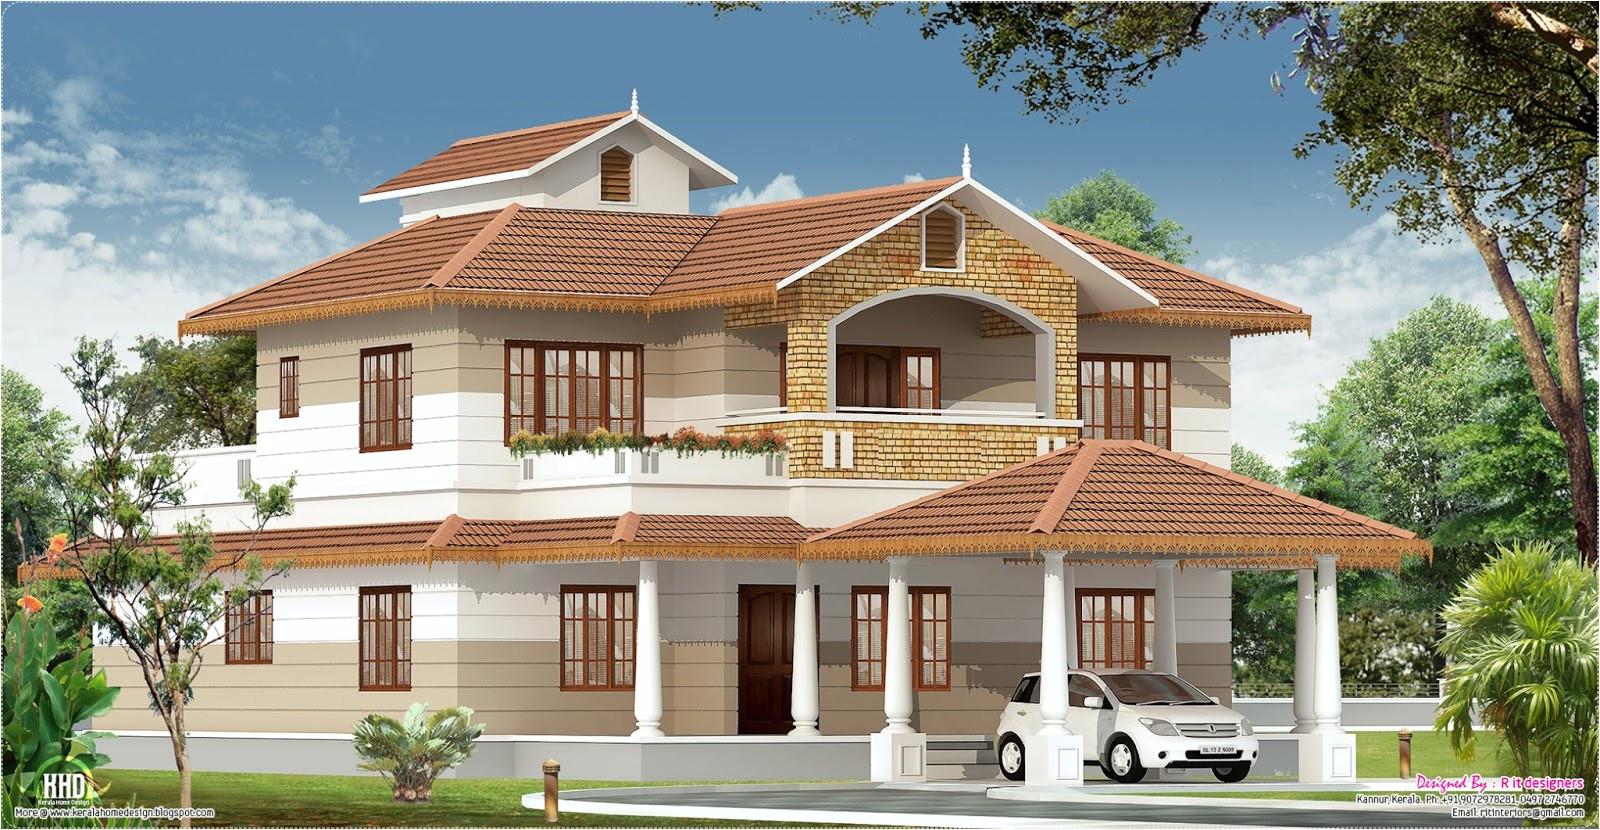 Kerala Home Plans January 2013 Kerala Home Design and Floor Plans